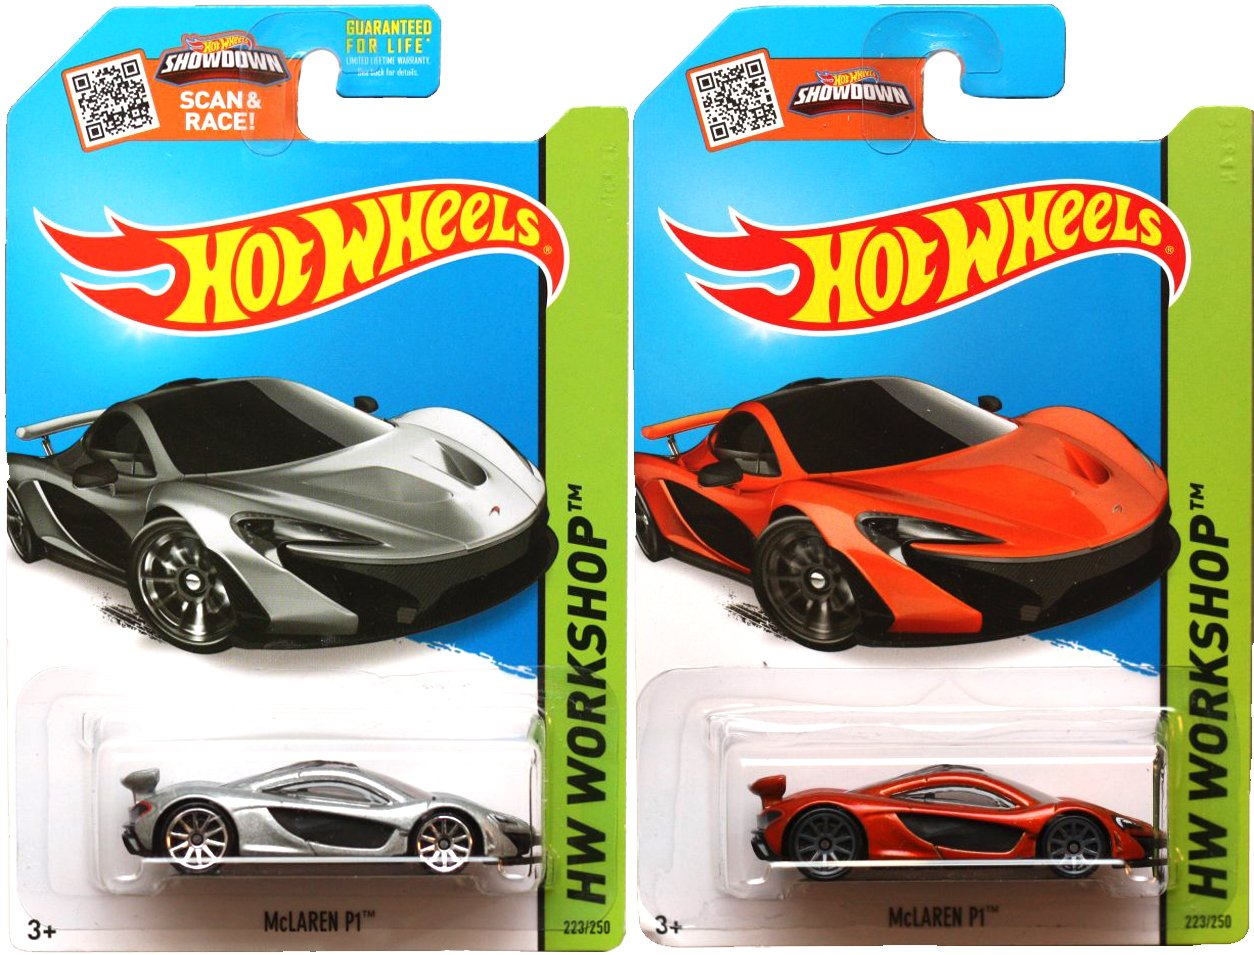 Mclaren P1 Set Of Hot Wheels 2 Cars Orange Silver Hw Workshop